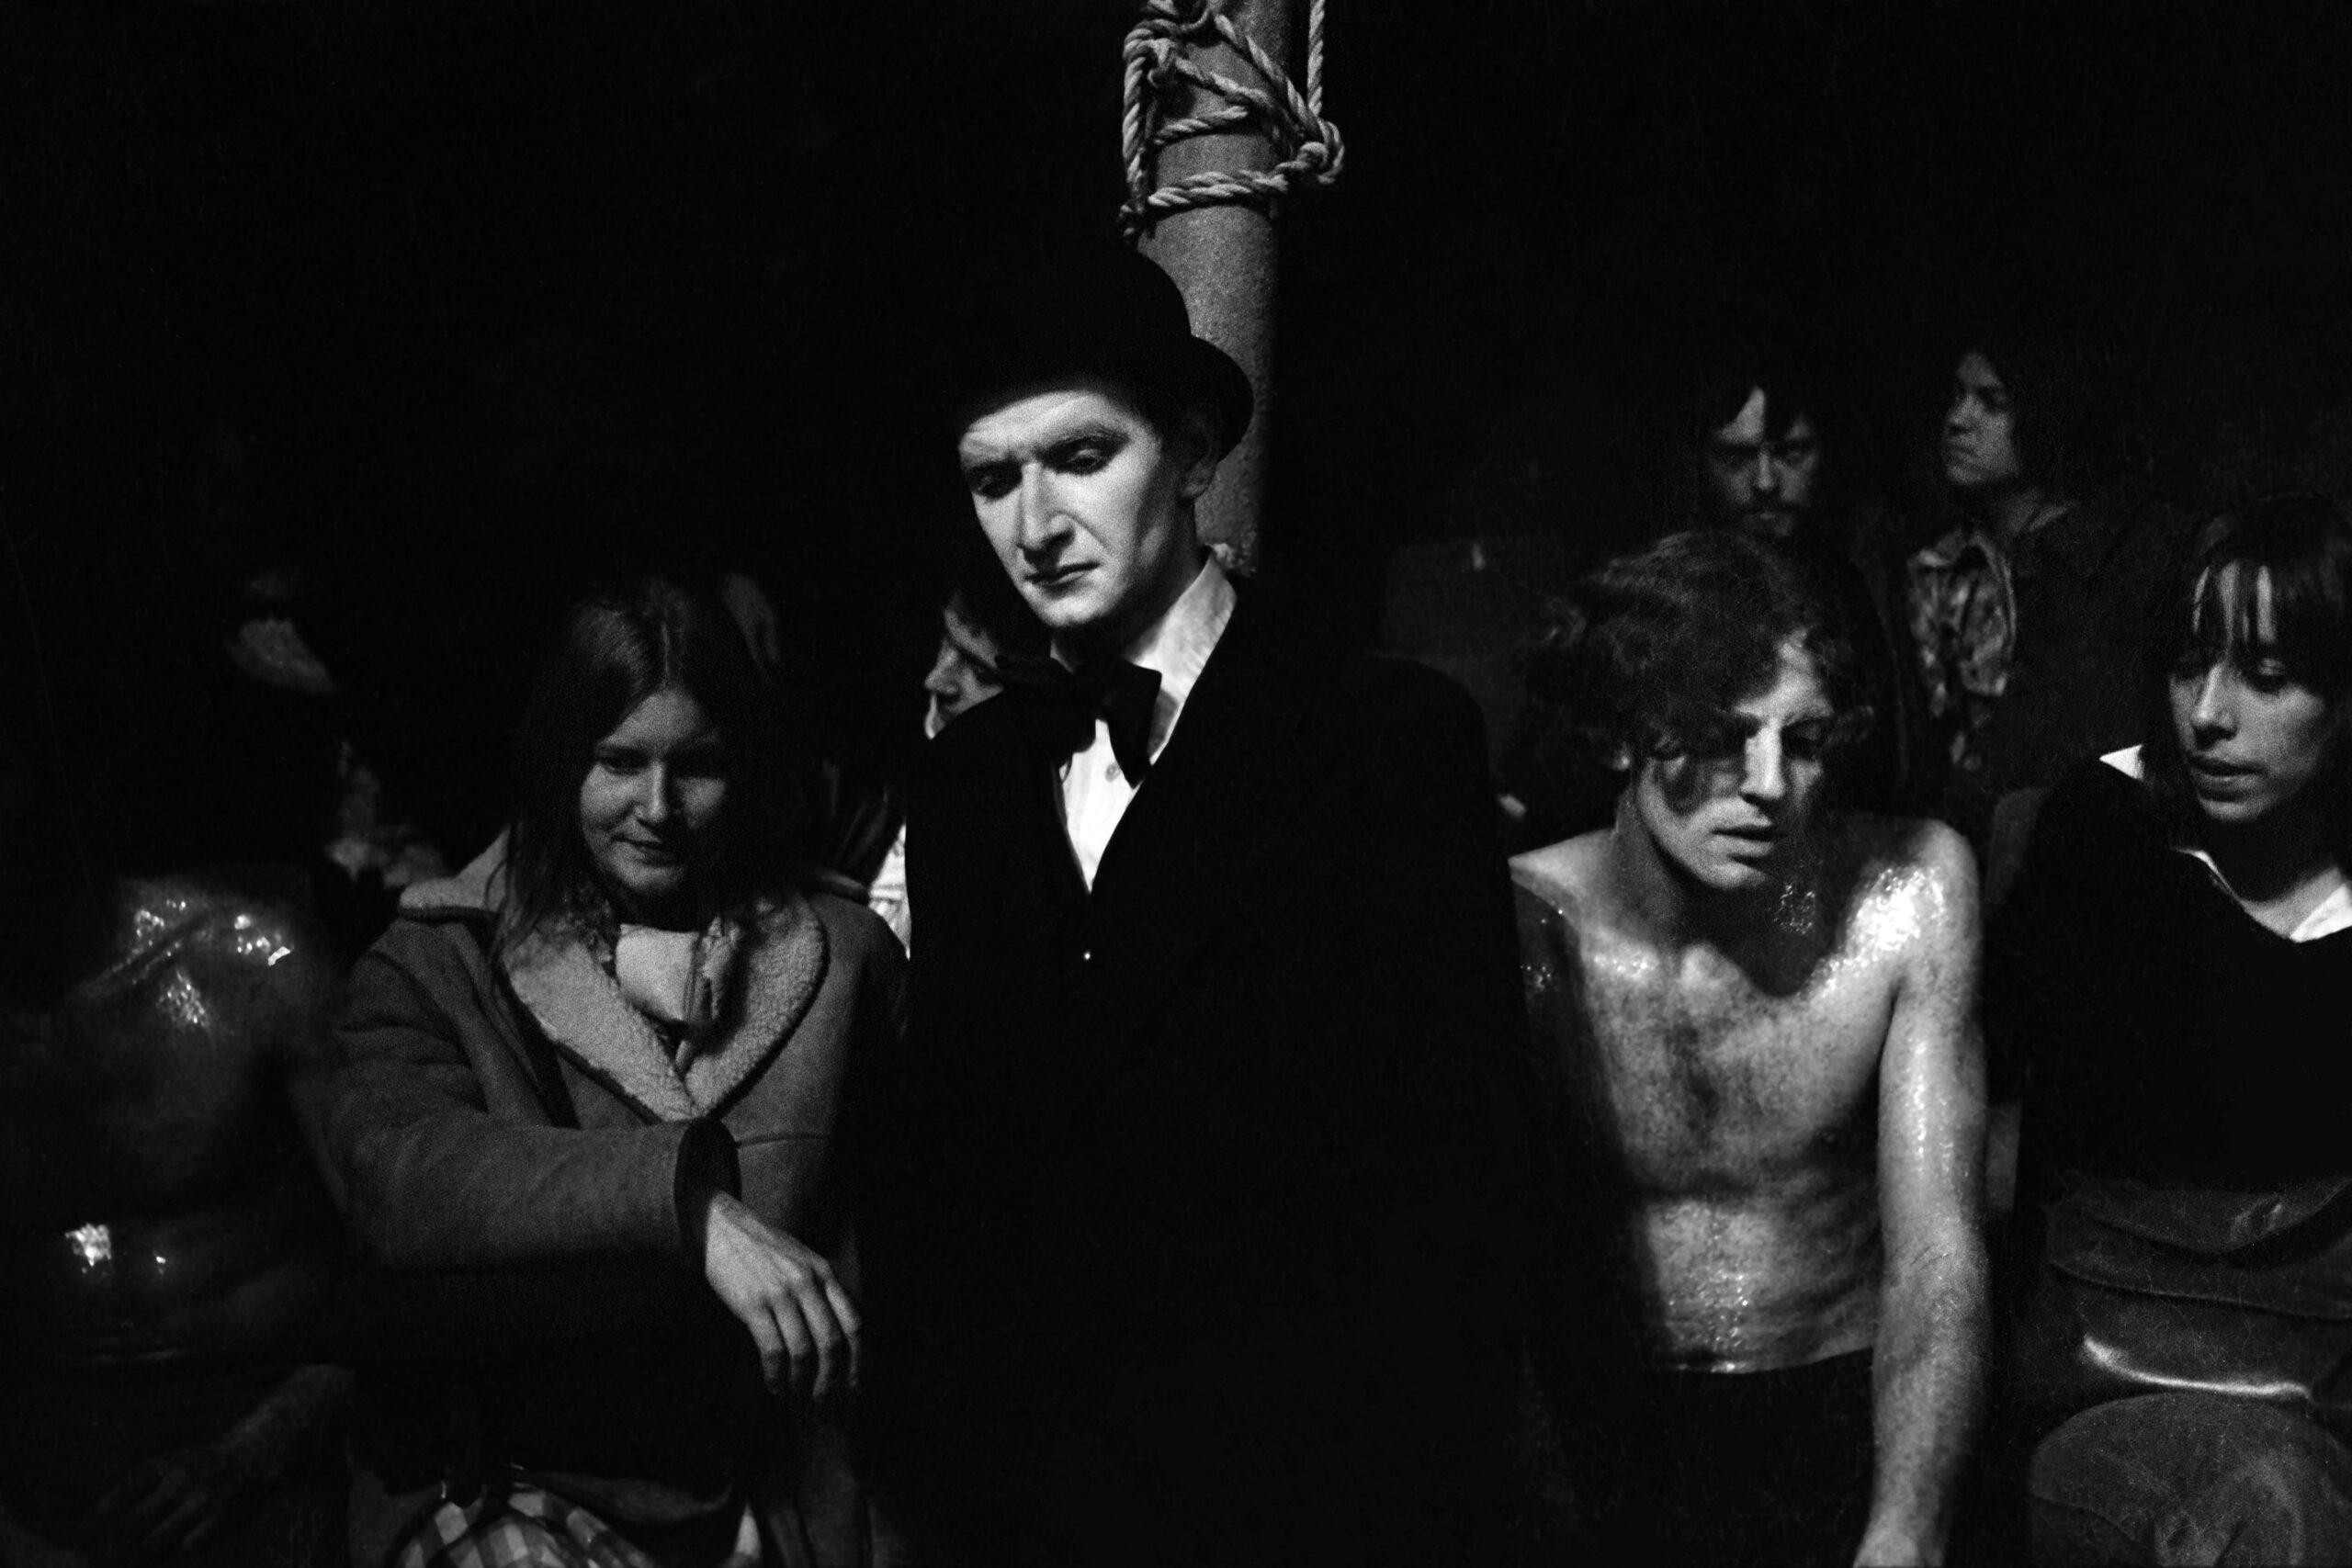 TEATRO - 4 – La troupe Le Palais des Merveilles in uno spettacolo, Parigi, inizi anni '70